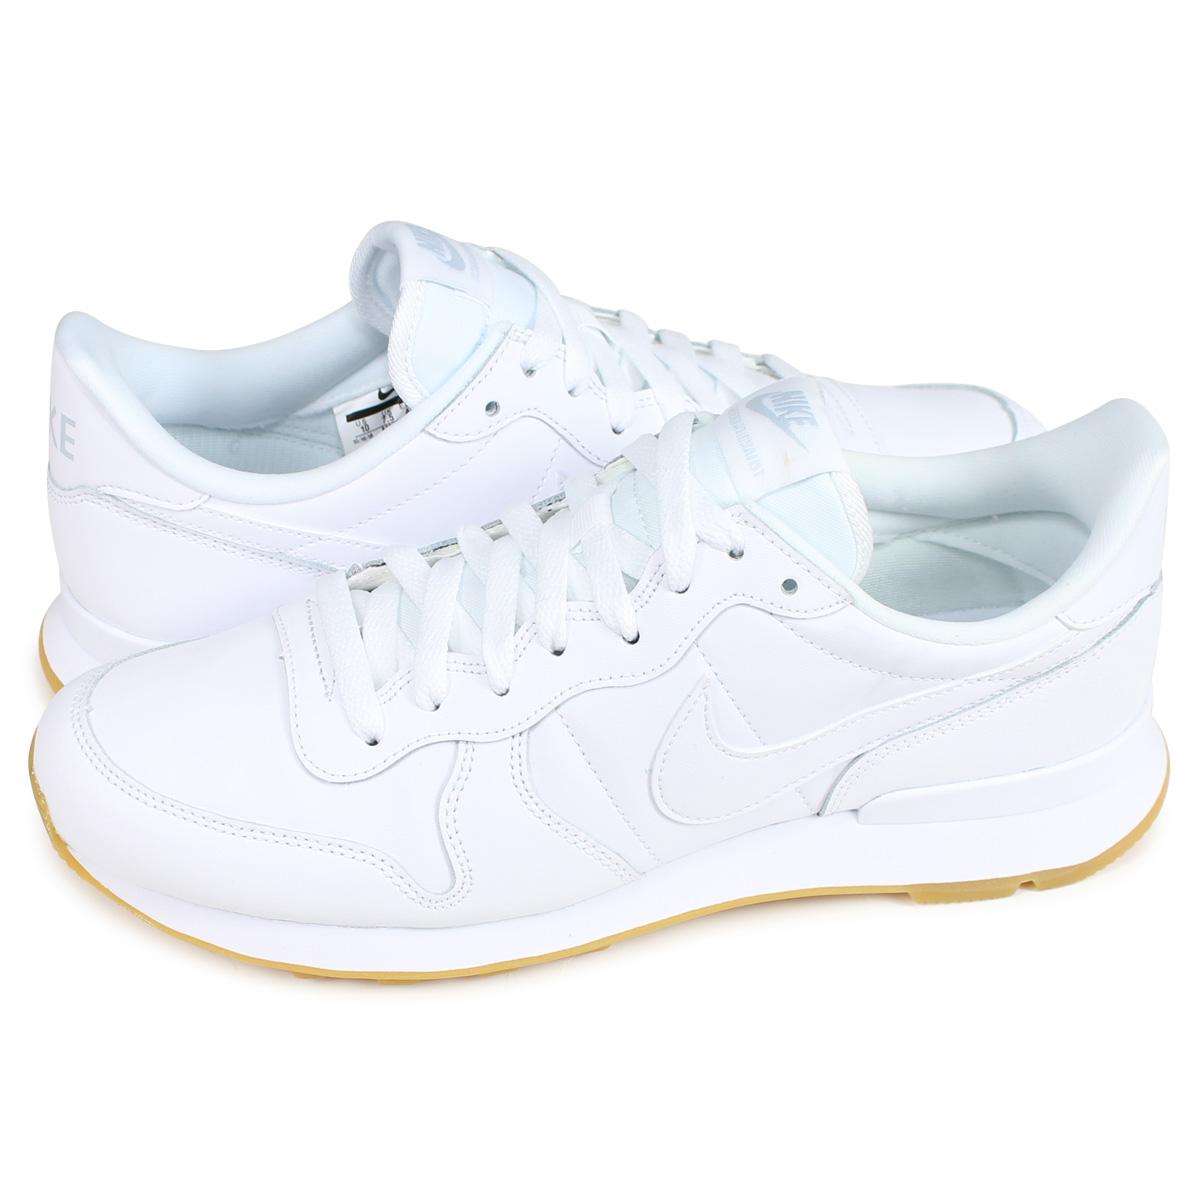 promo code 5243b cb4c5 Nike NIKE internationalist sneakers men WMNS INTERNATIONALIST white white  828,407-103  193